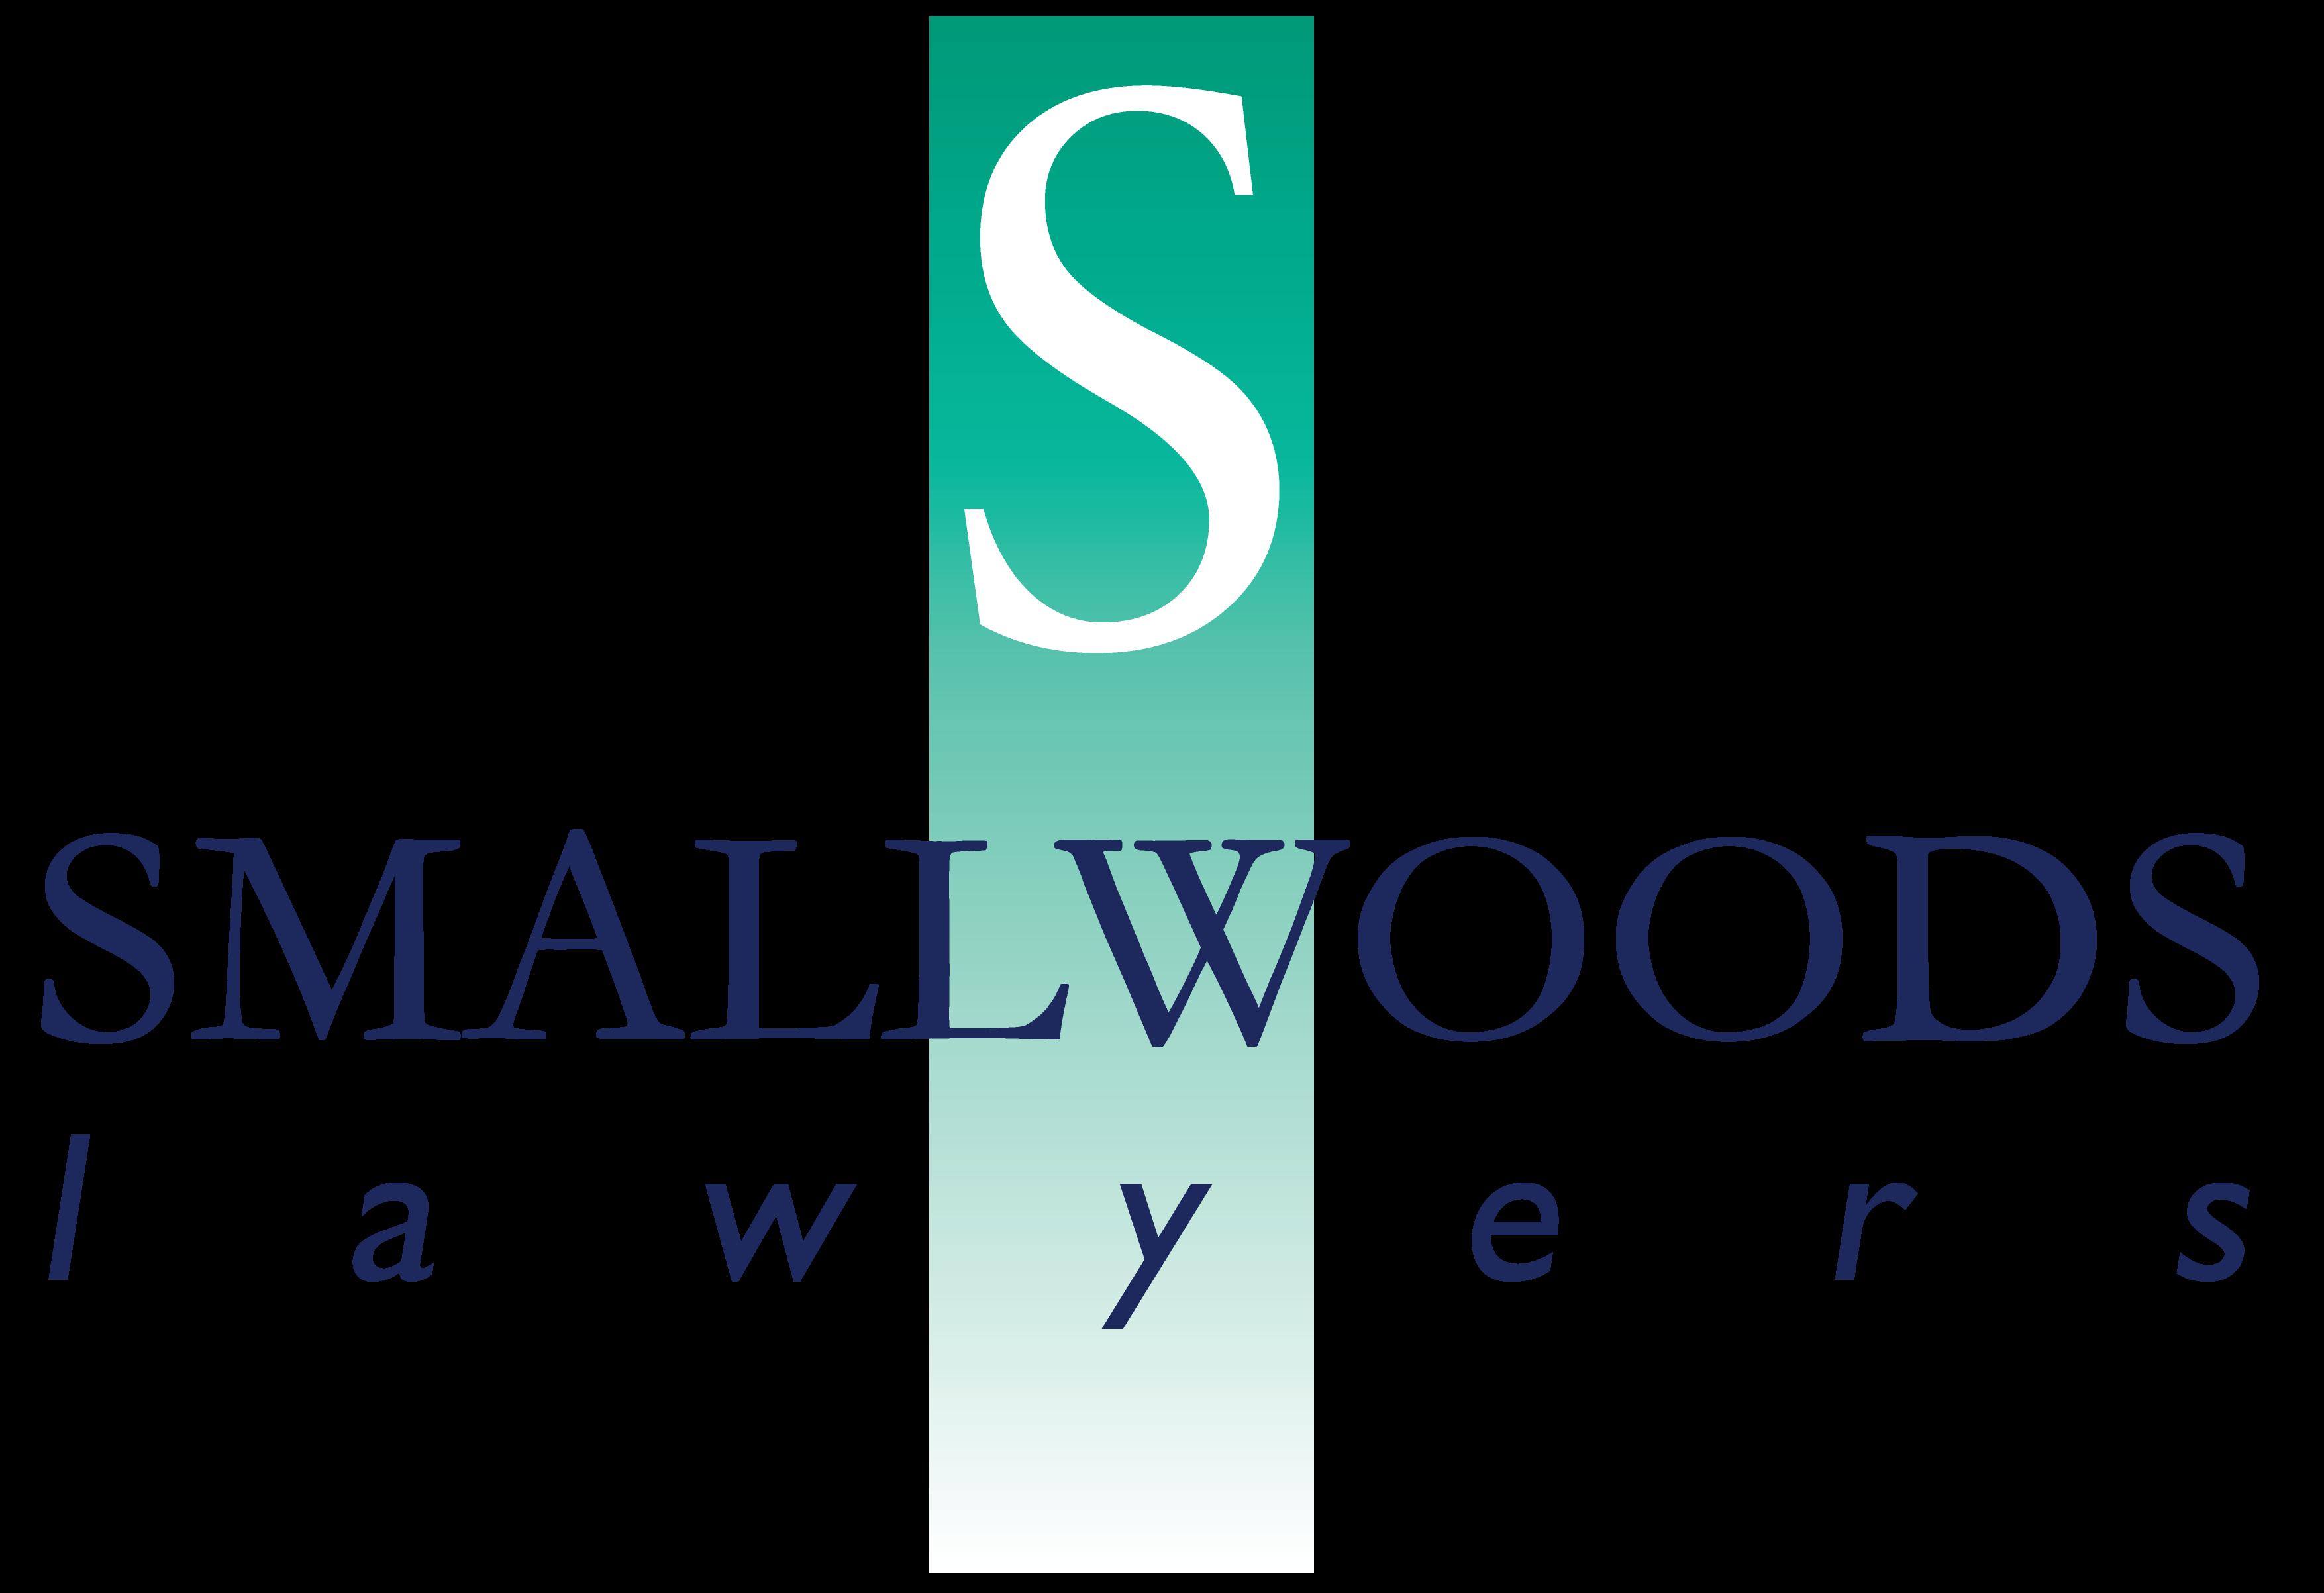 Smallwoods Lawyers